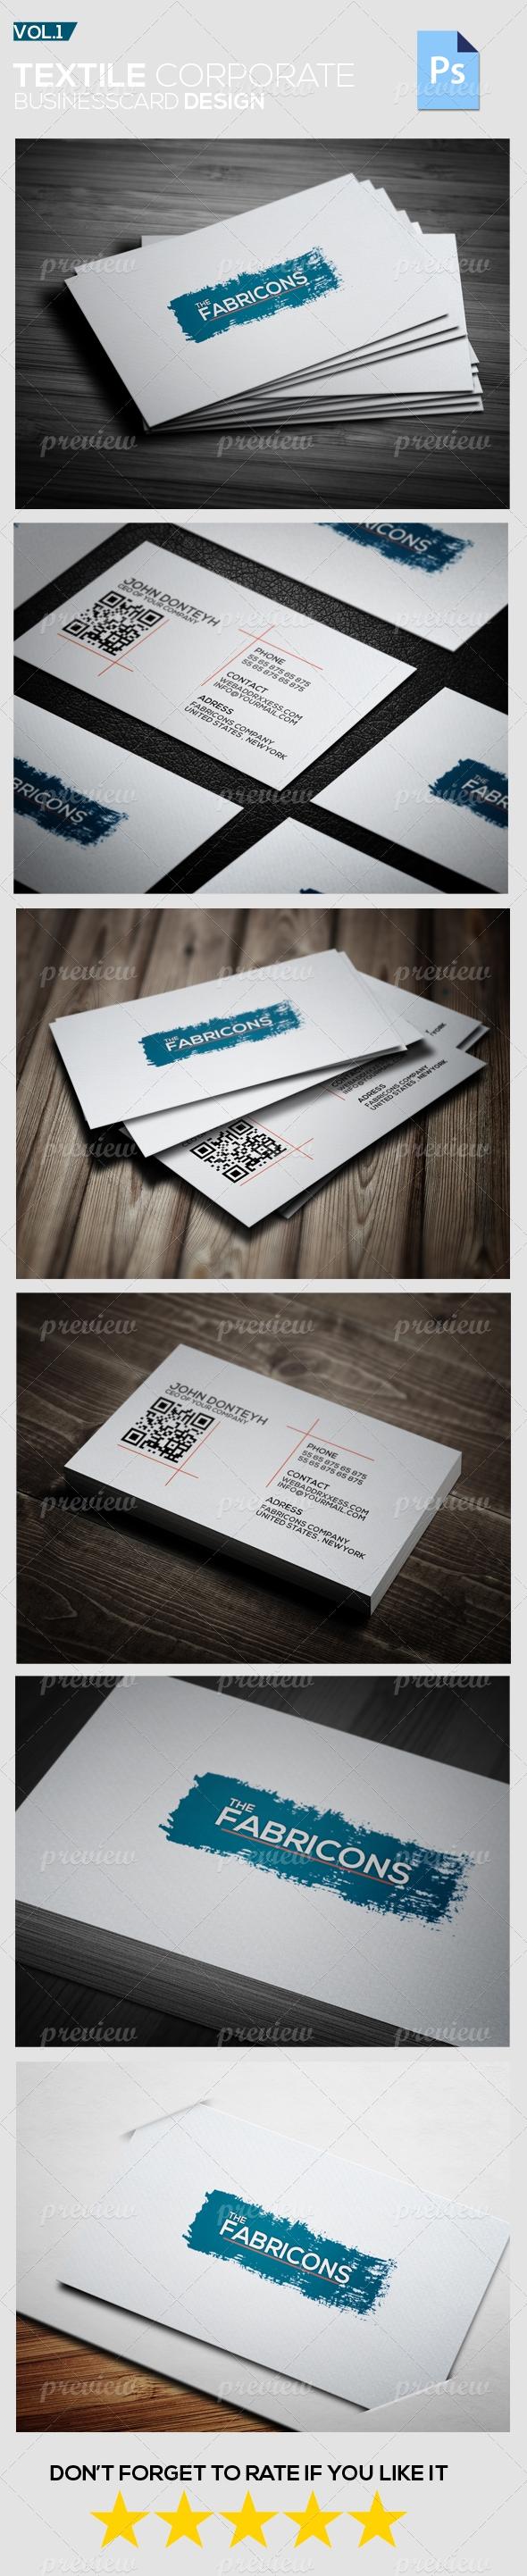 Textile Corporate Business Card